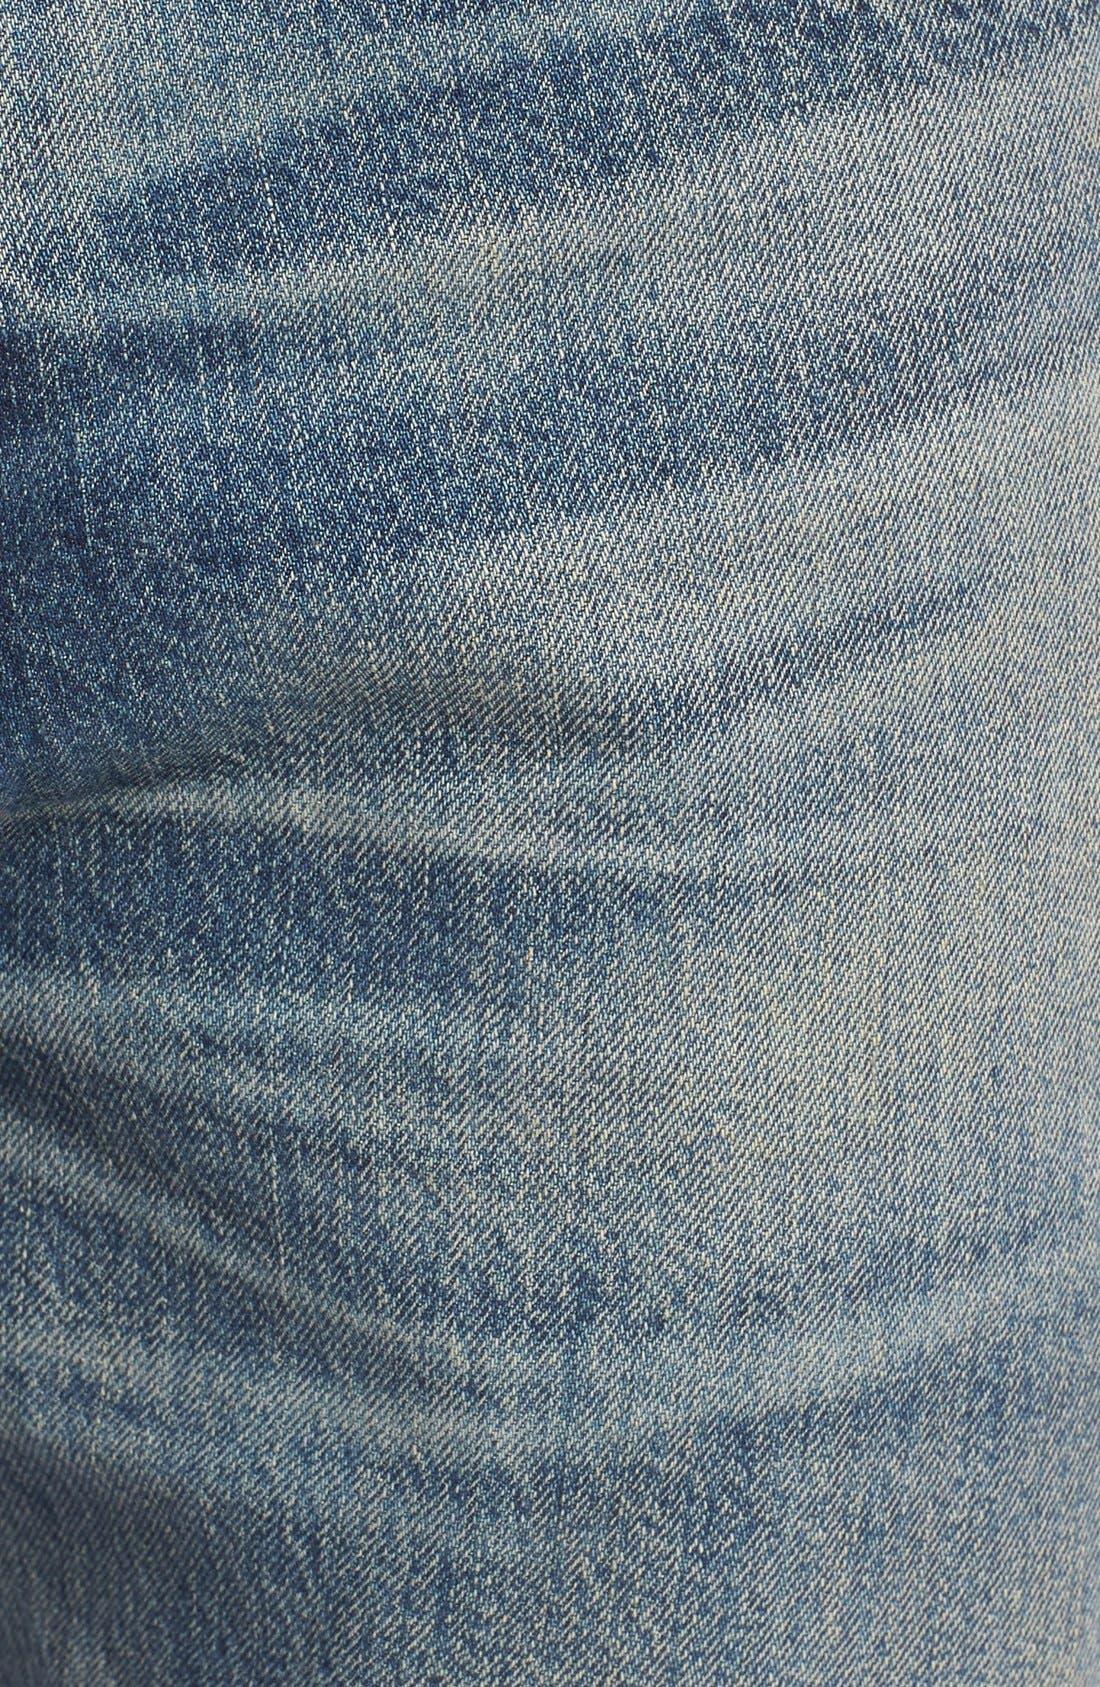 Rowan Slouchy Skinny Fit Jeans,                             Alternate thumbnail 5, color,                             462